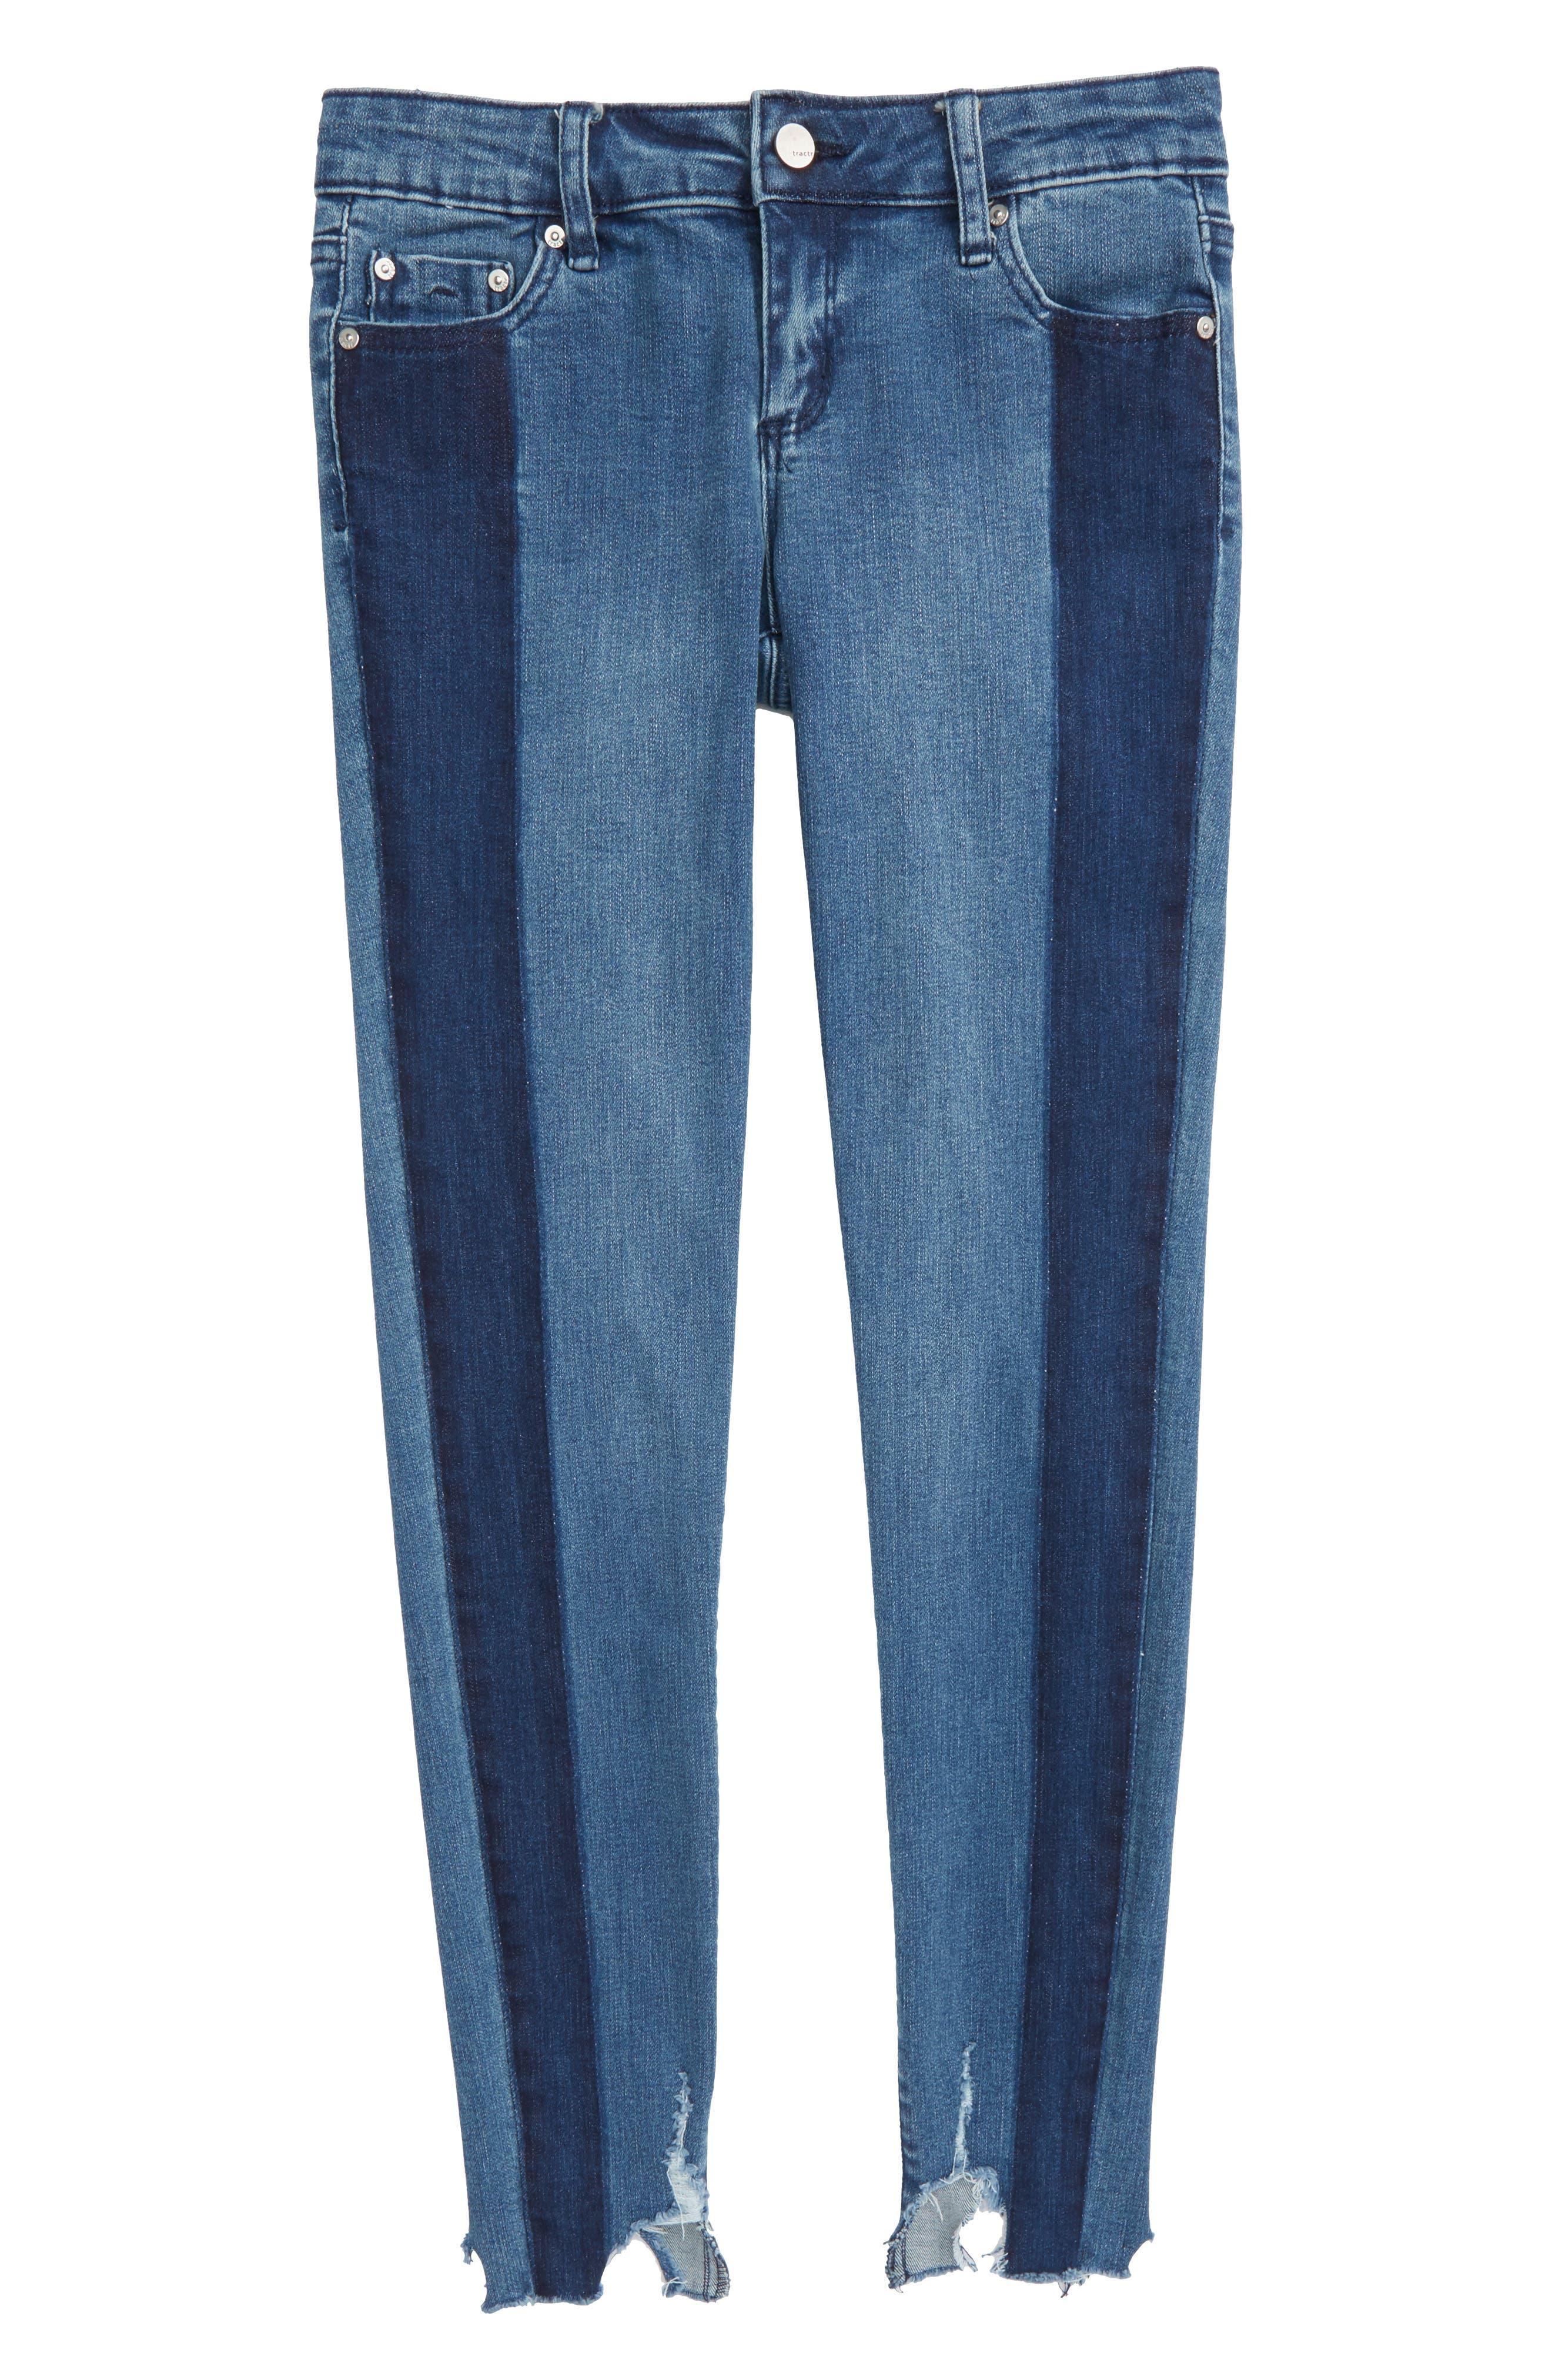 Crop Skinny Jeans,                             Main thumbnail 1, color,                             Indigo